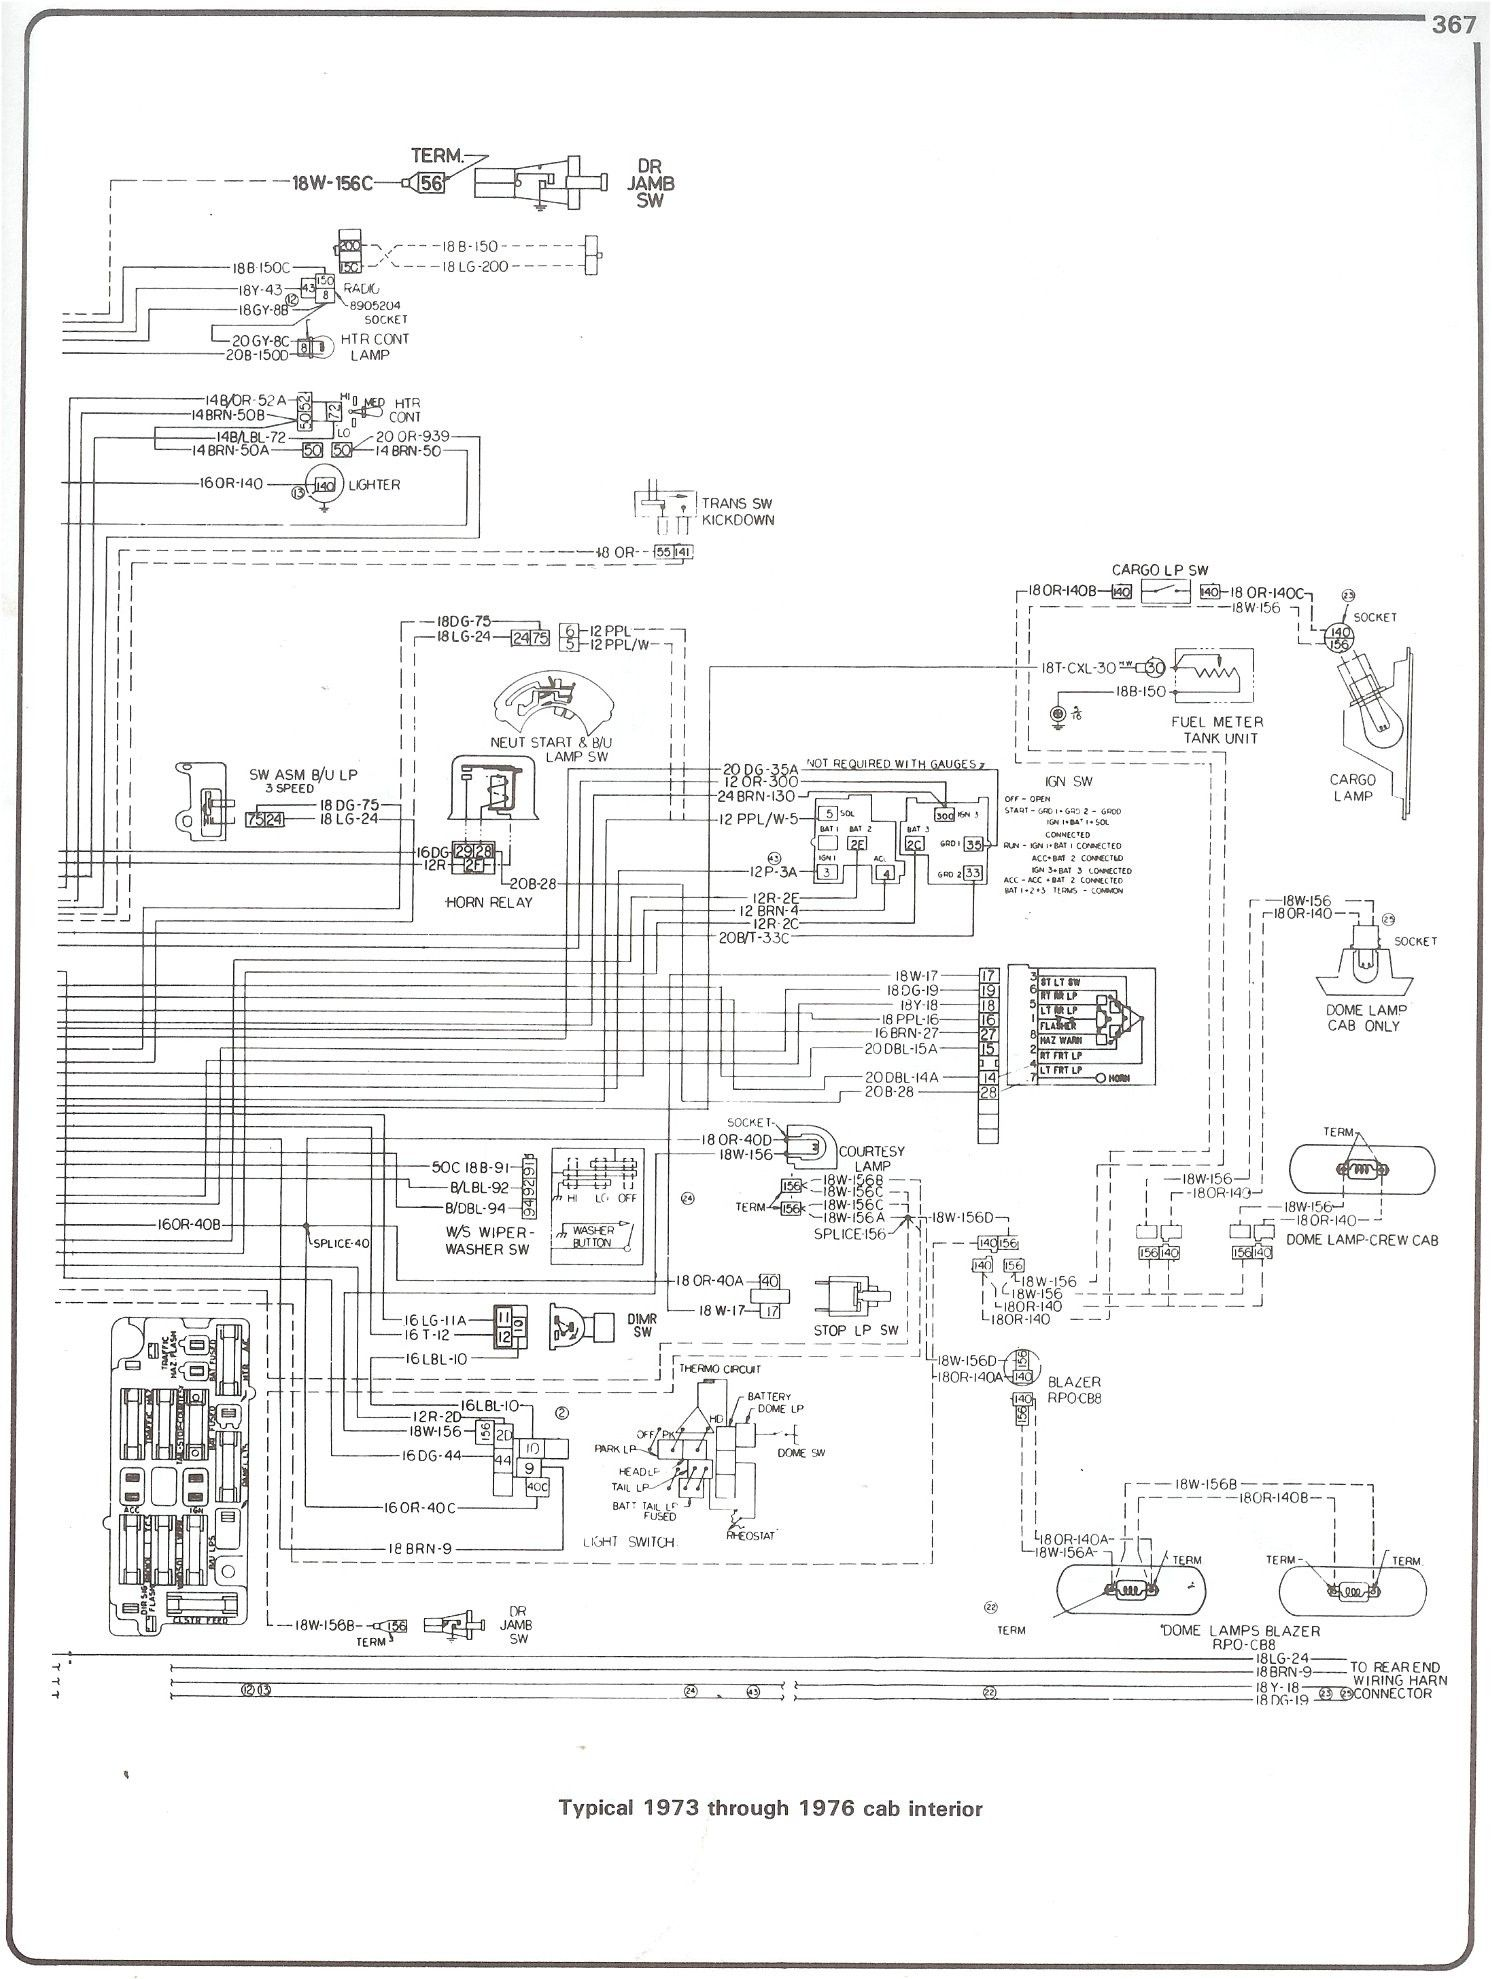 Wire Diagram For Inverter In A 2010 Tiffin Phaeton In 2021 Chevy Trucks 1984 Chevy Truck Wiring Diagram